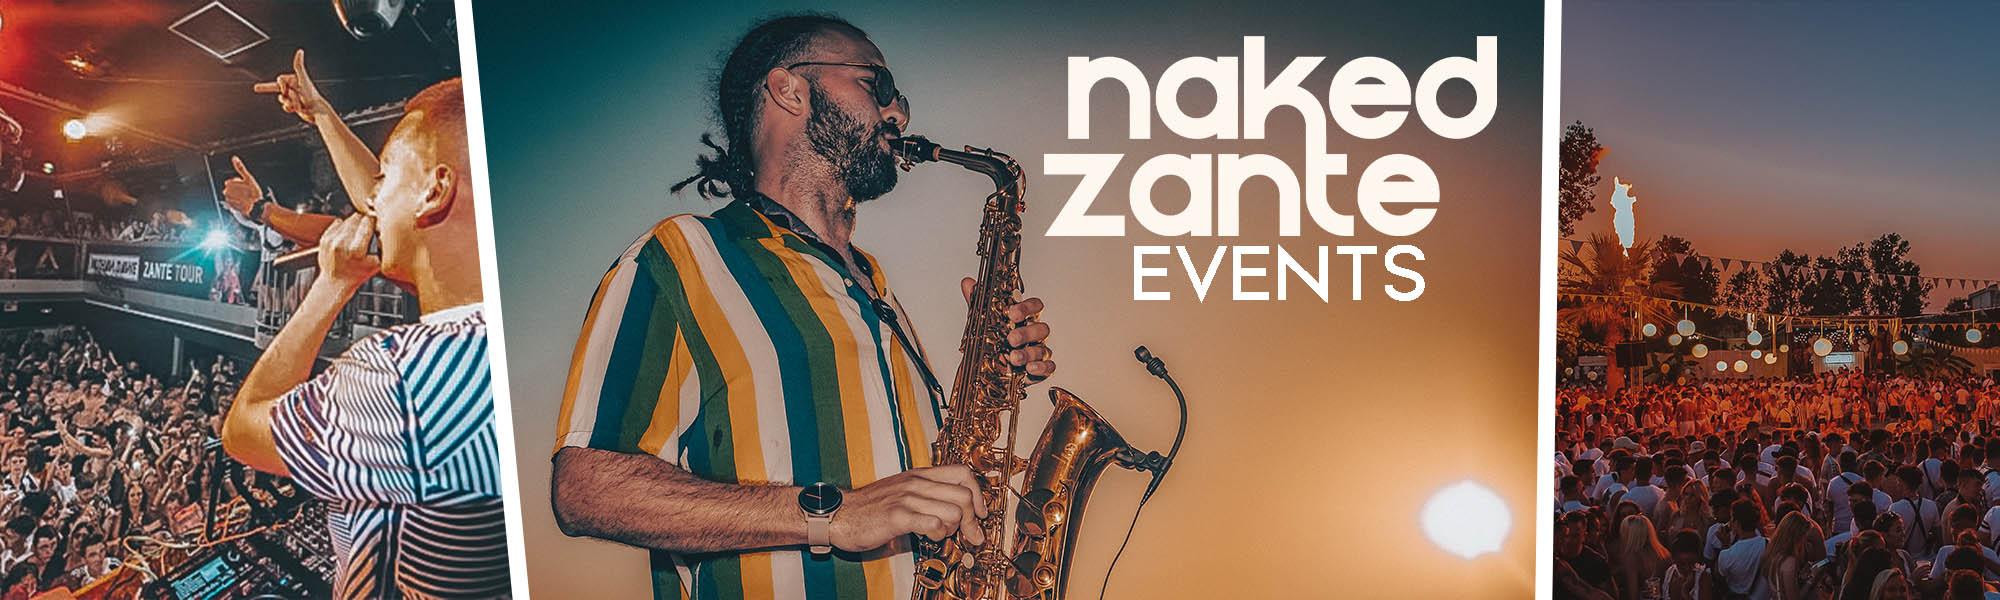 zante nightlife events 2021